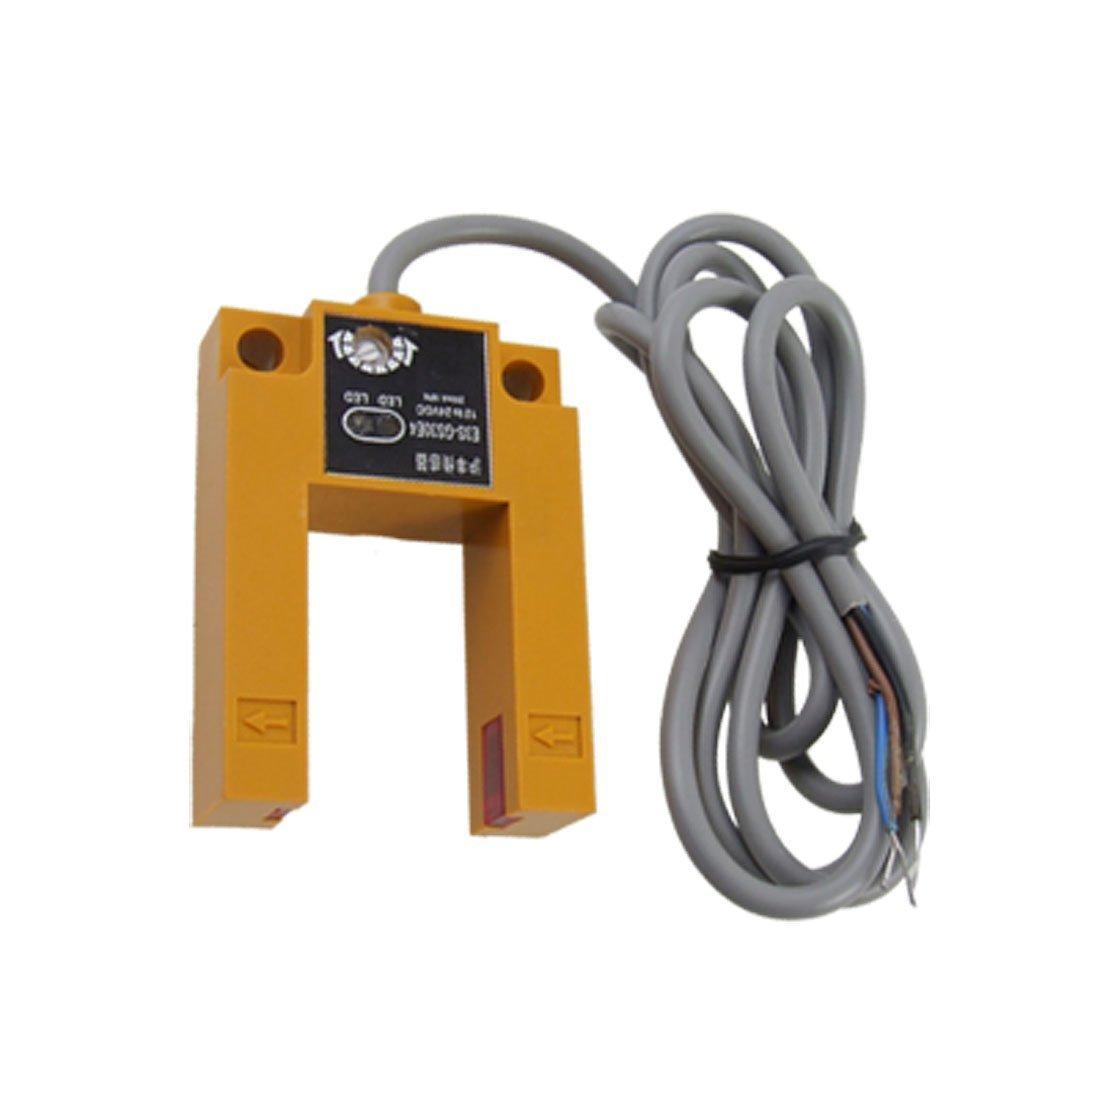 Baomain Photoelectric Switch Sensor E3S-GS30E4 Diffuse Groove Shap